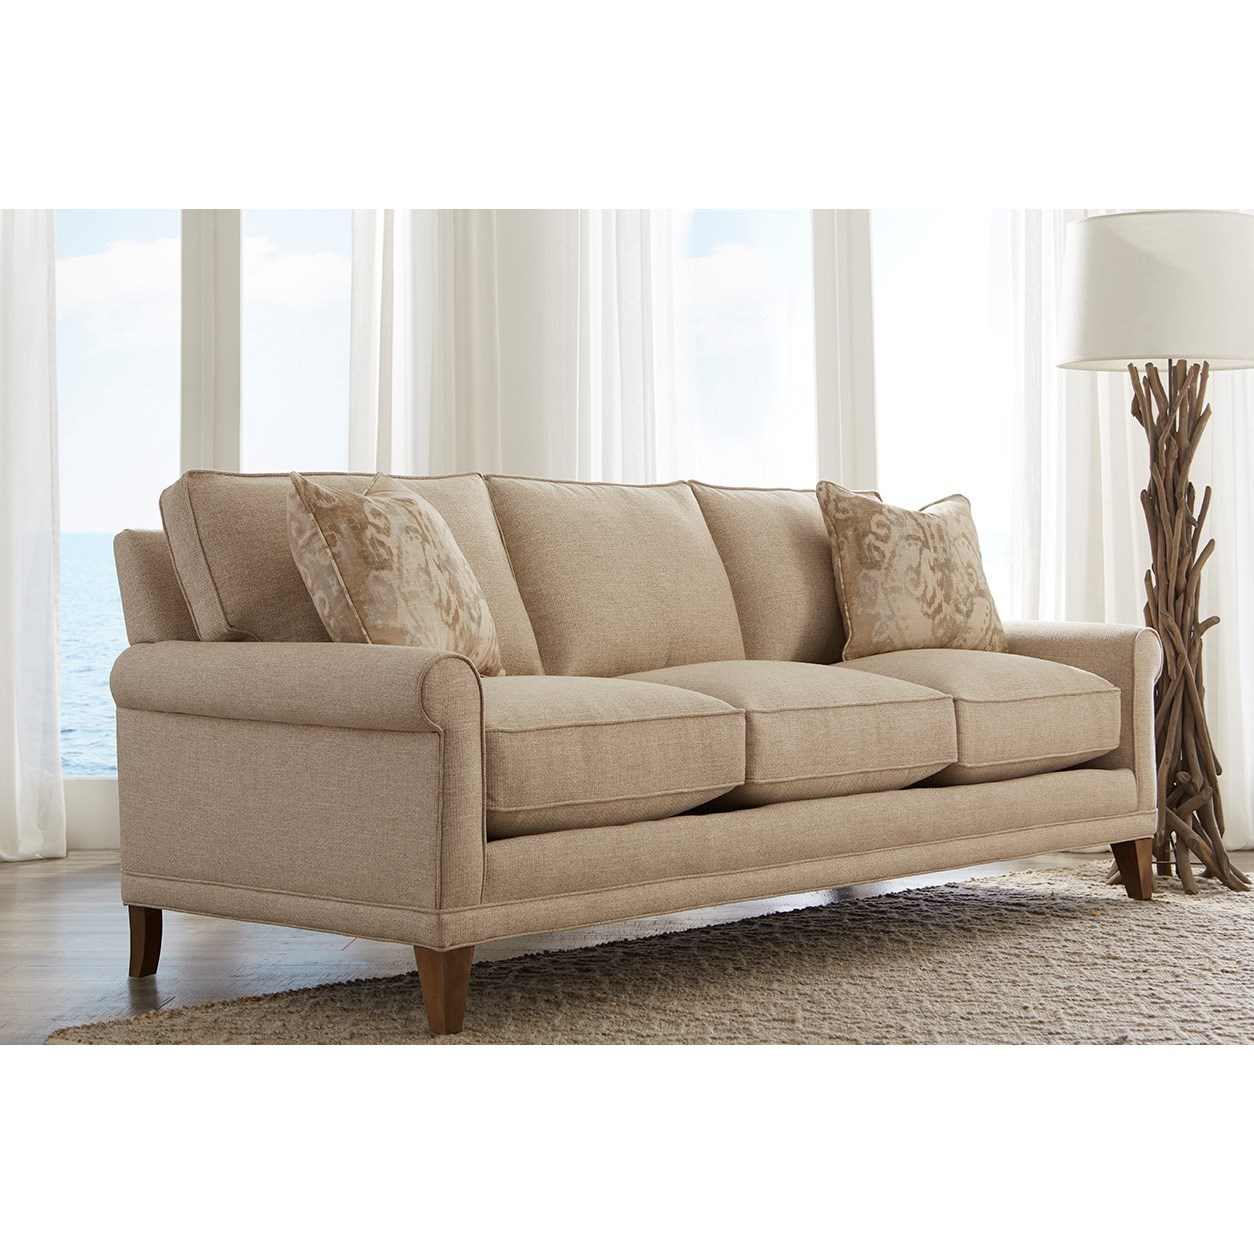 Rowe My Style Ii Customizable Sofa Sleeper With Rolled